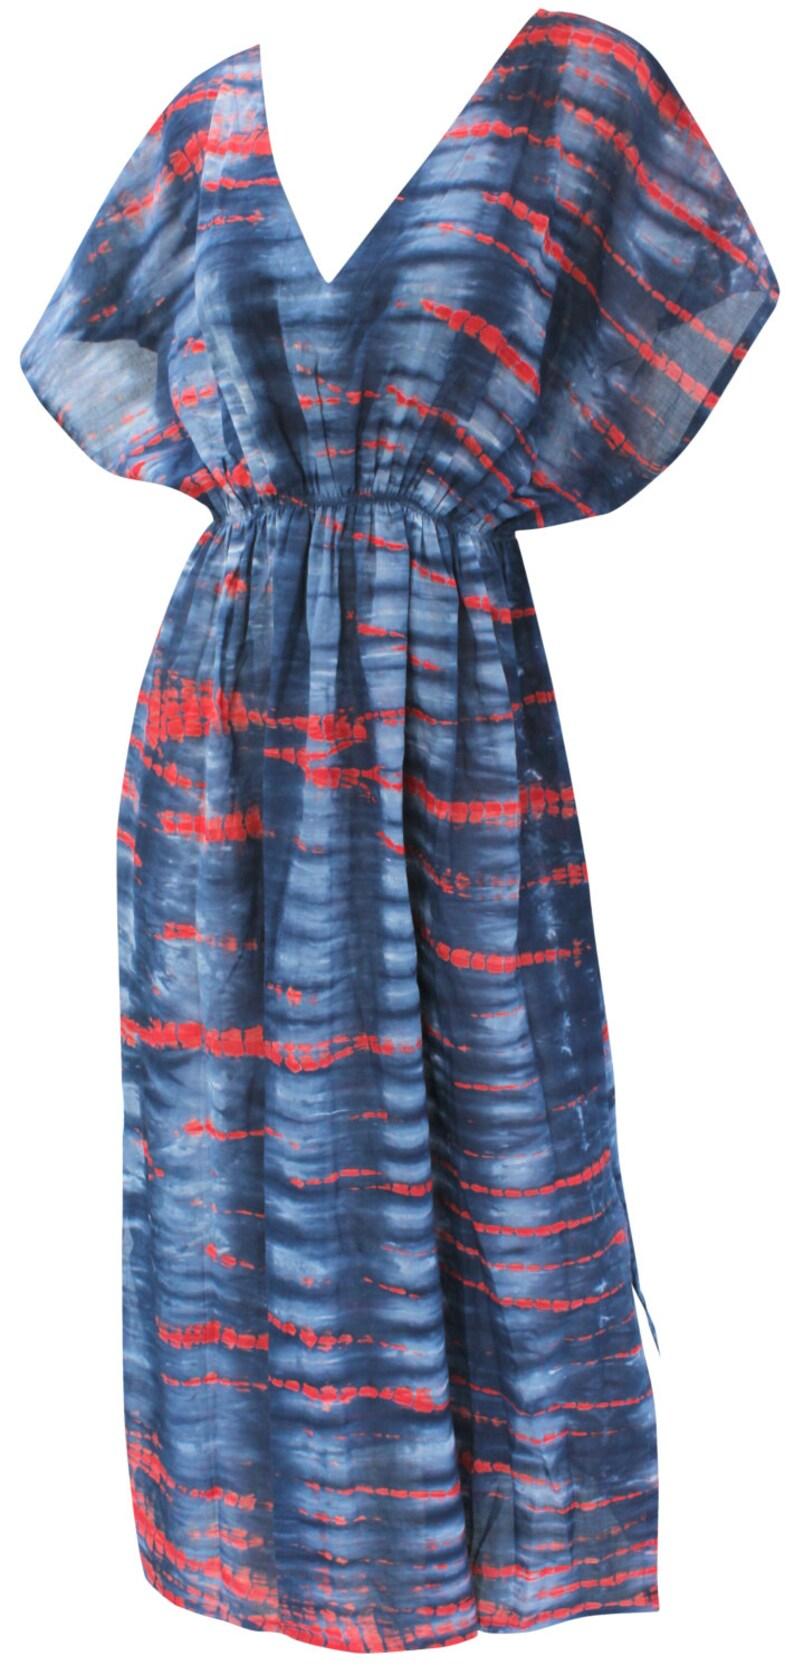 LA LEELA Multipurpose Soft Rayon Stretchable Caftan Cover up Long Casual Dress